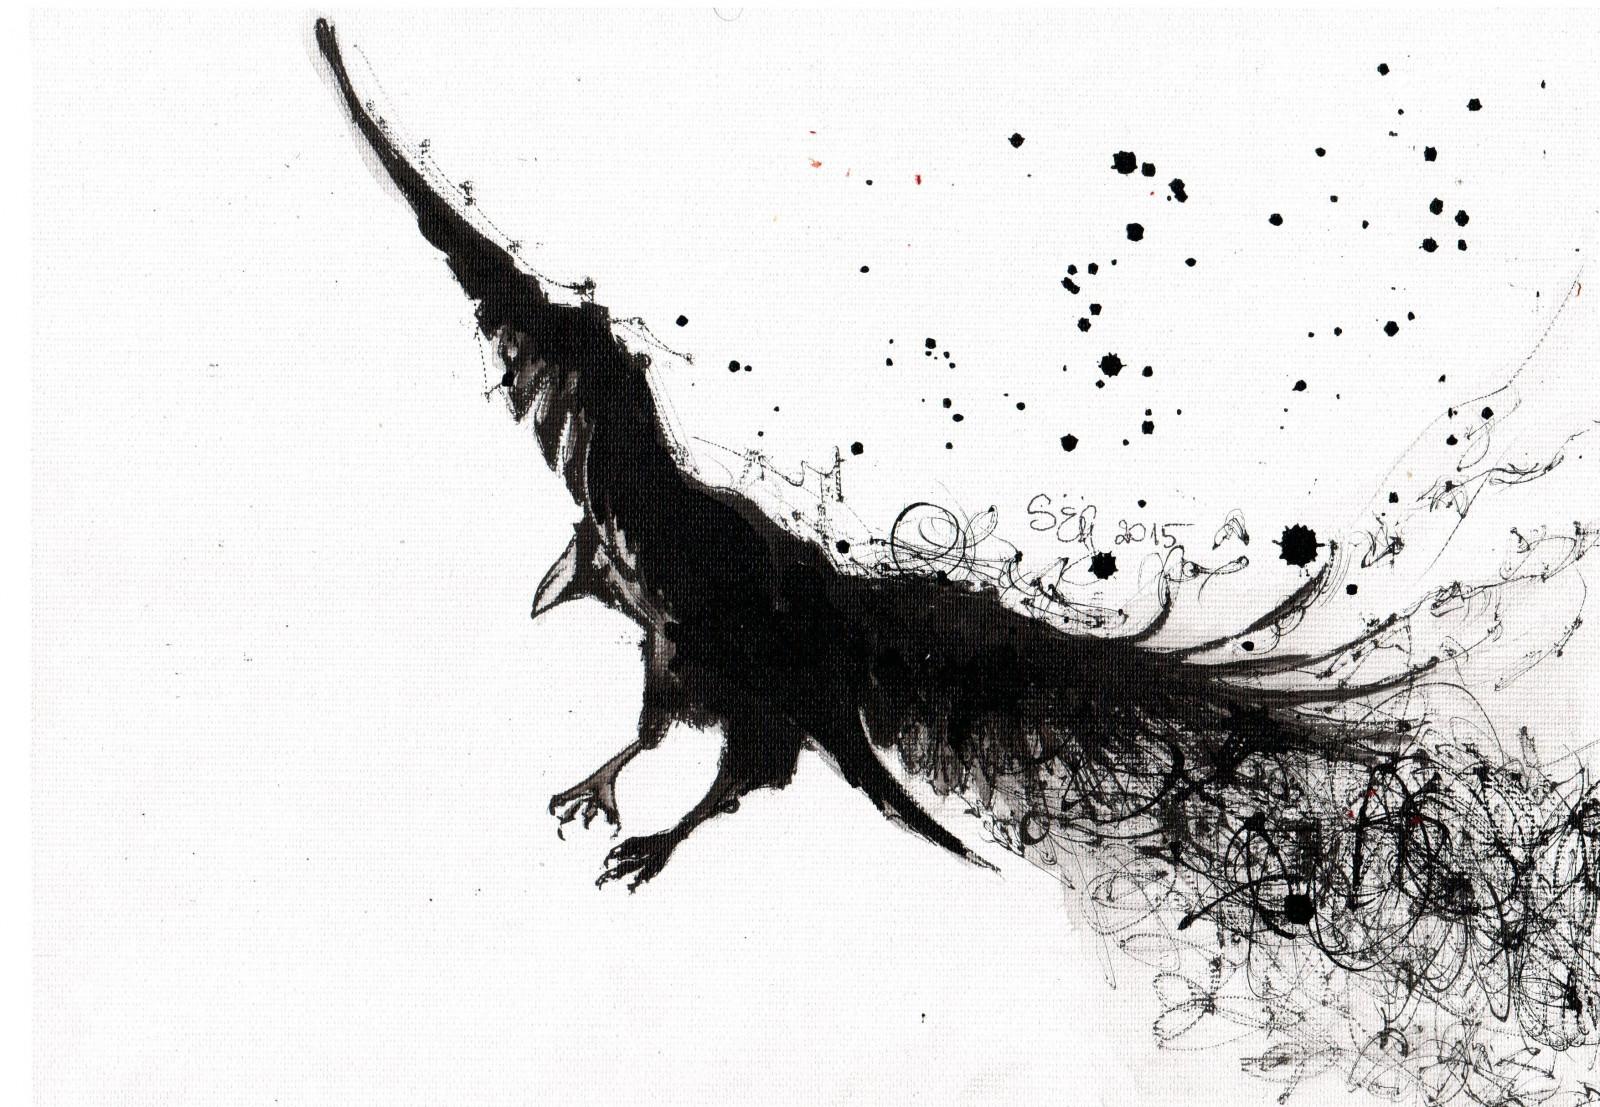 Fondos De Pantalla : Dibujo, Aves, Monocromo, Rama, Cuervo